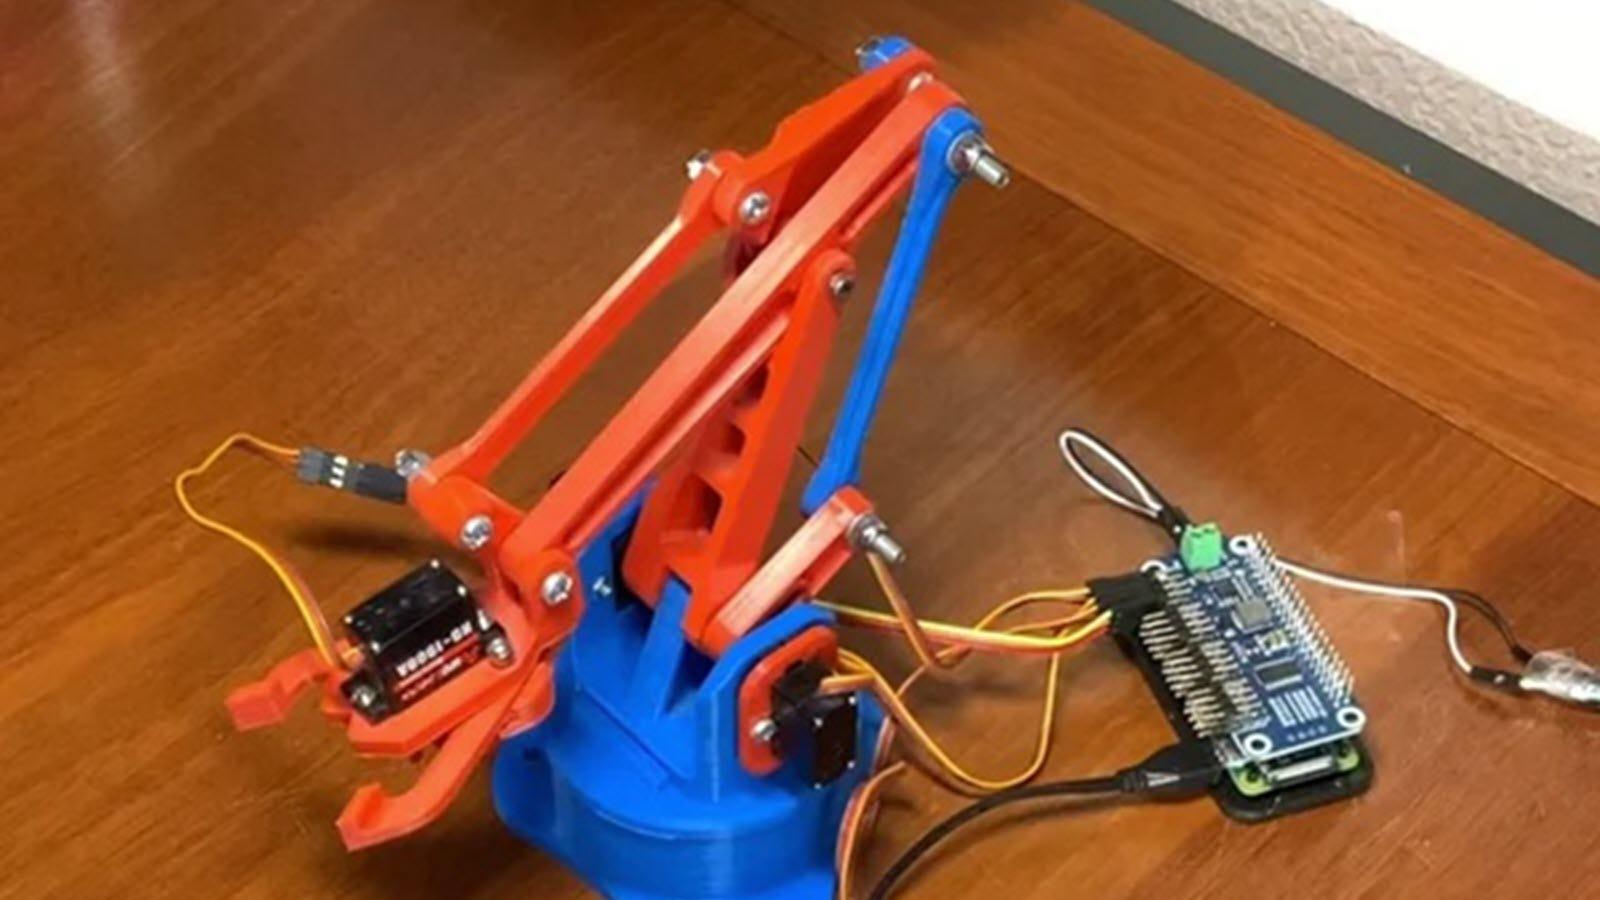 A 3d printed robot arm.